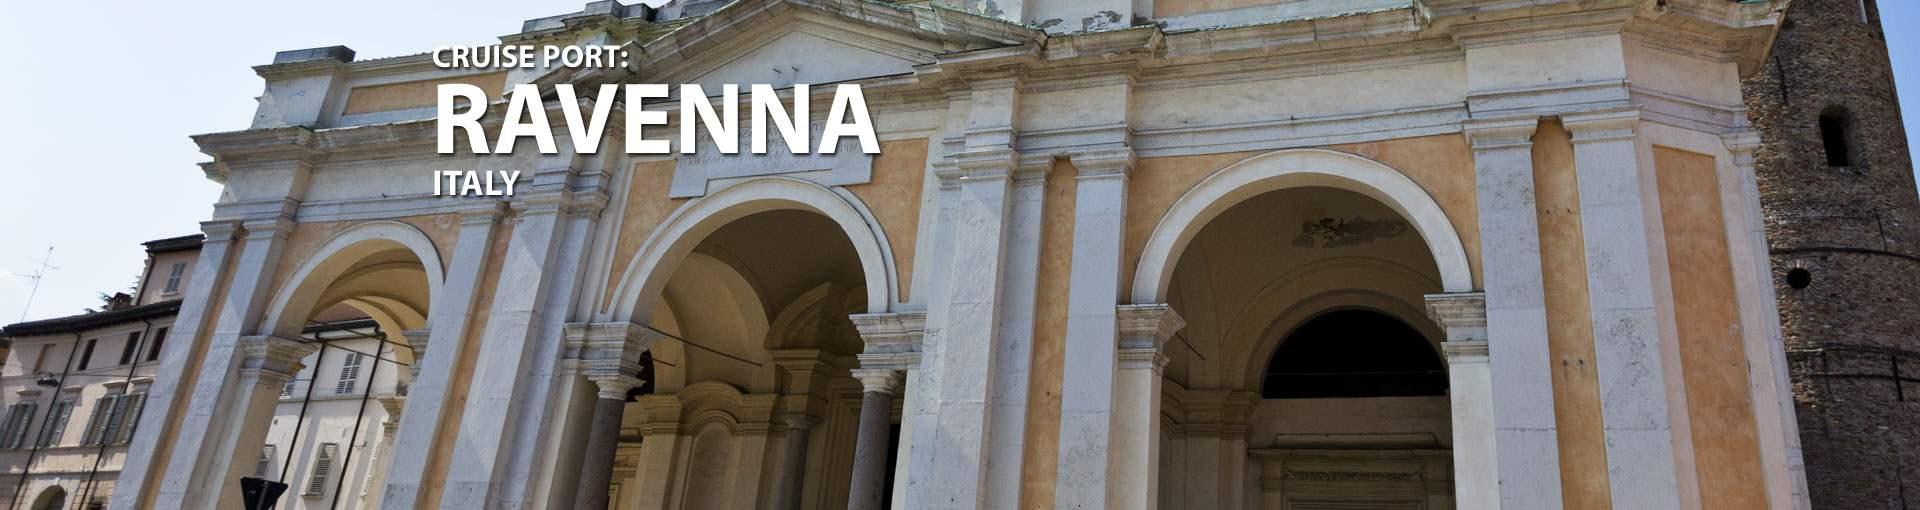 Cruises to Ravenna, Italy